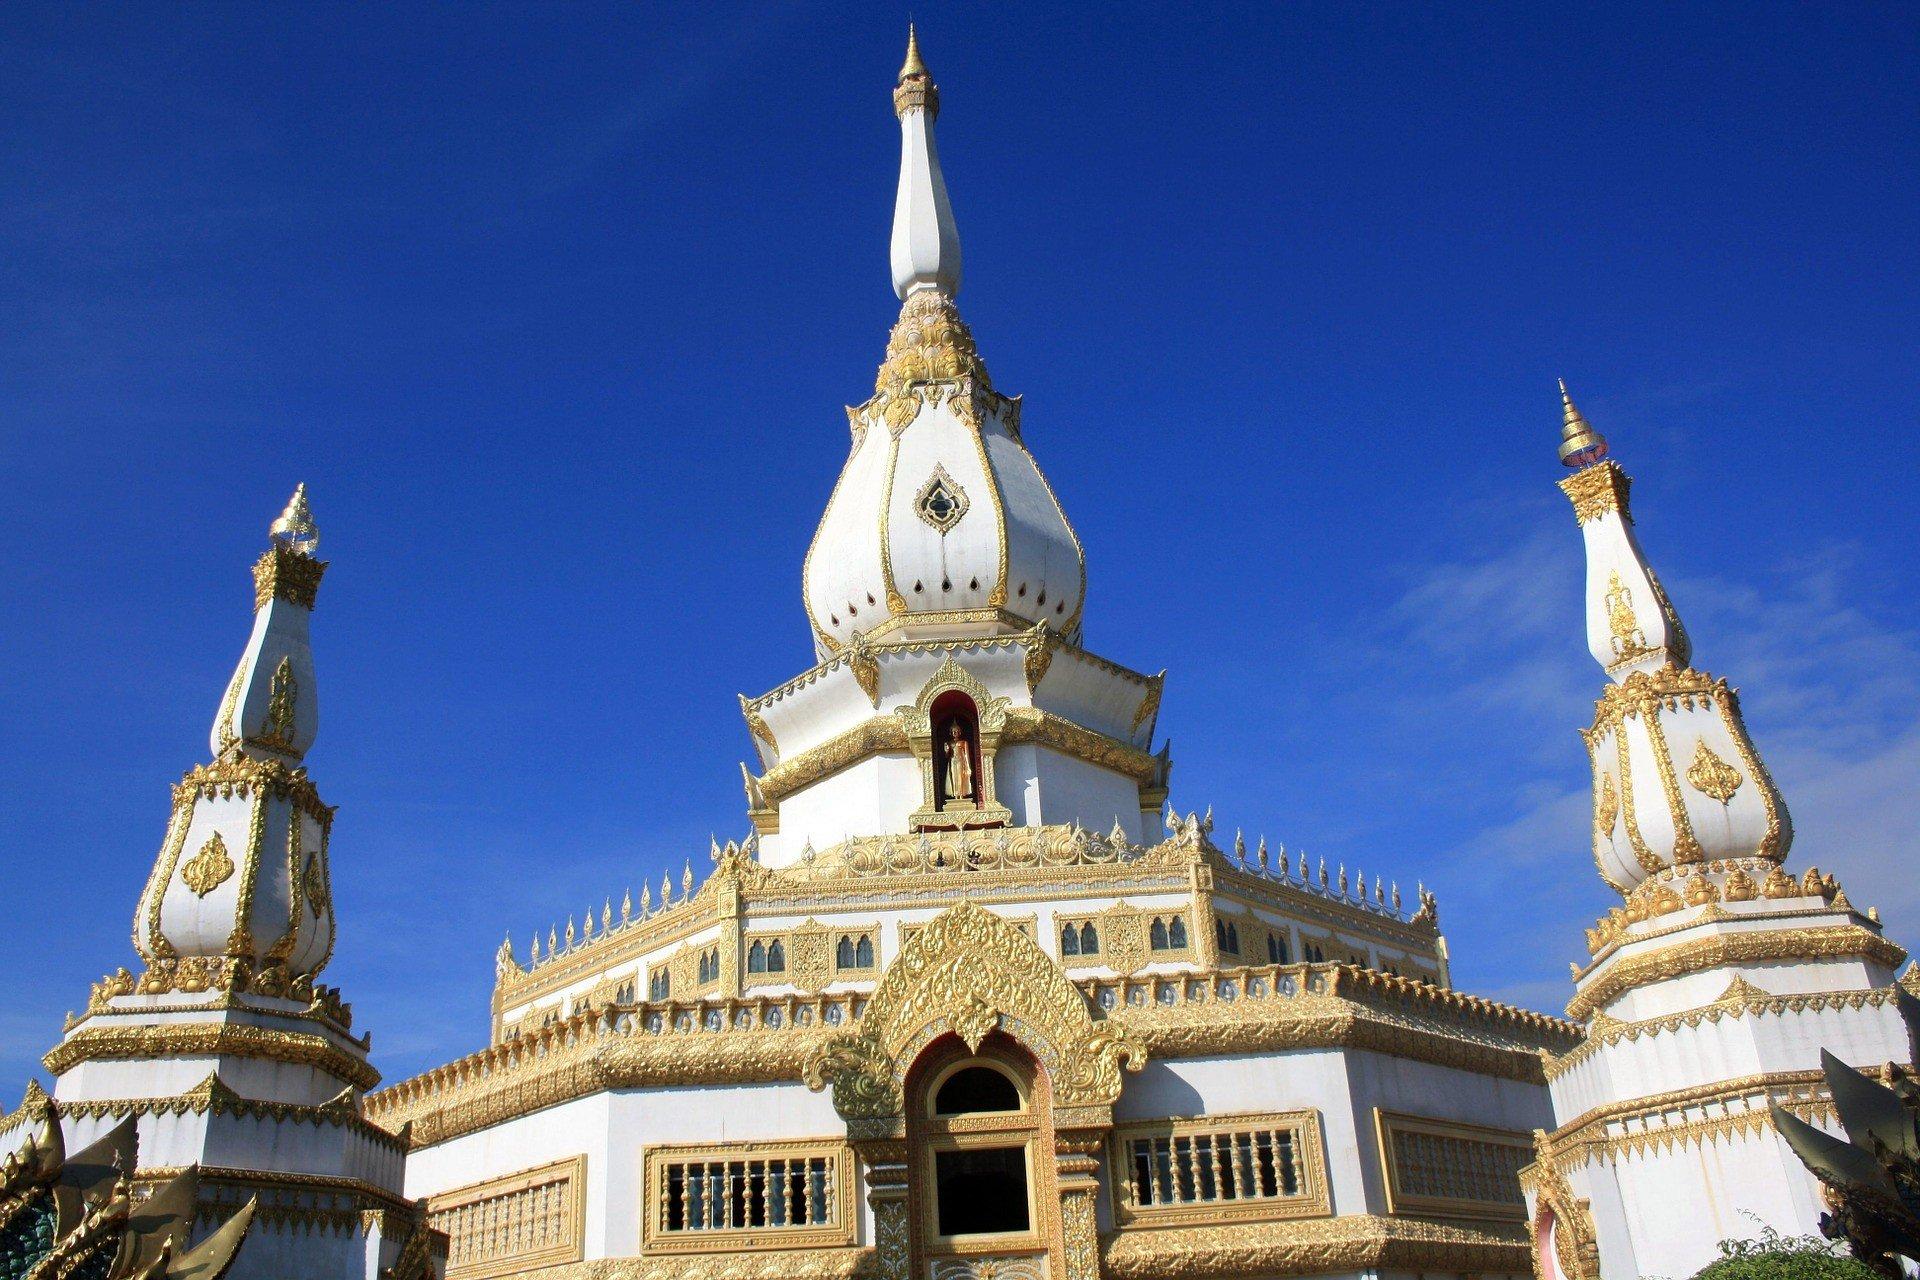 Phra Maha Chedi Chai Mongkol in Roi Et